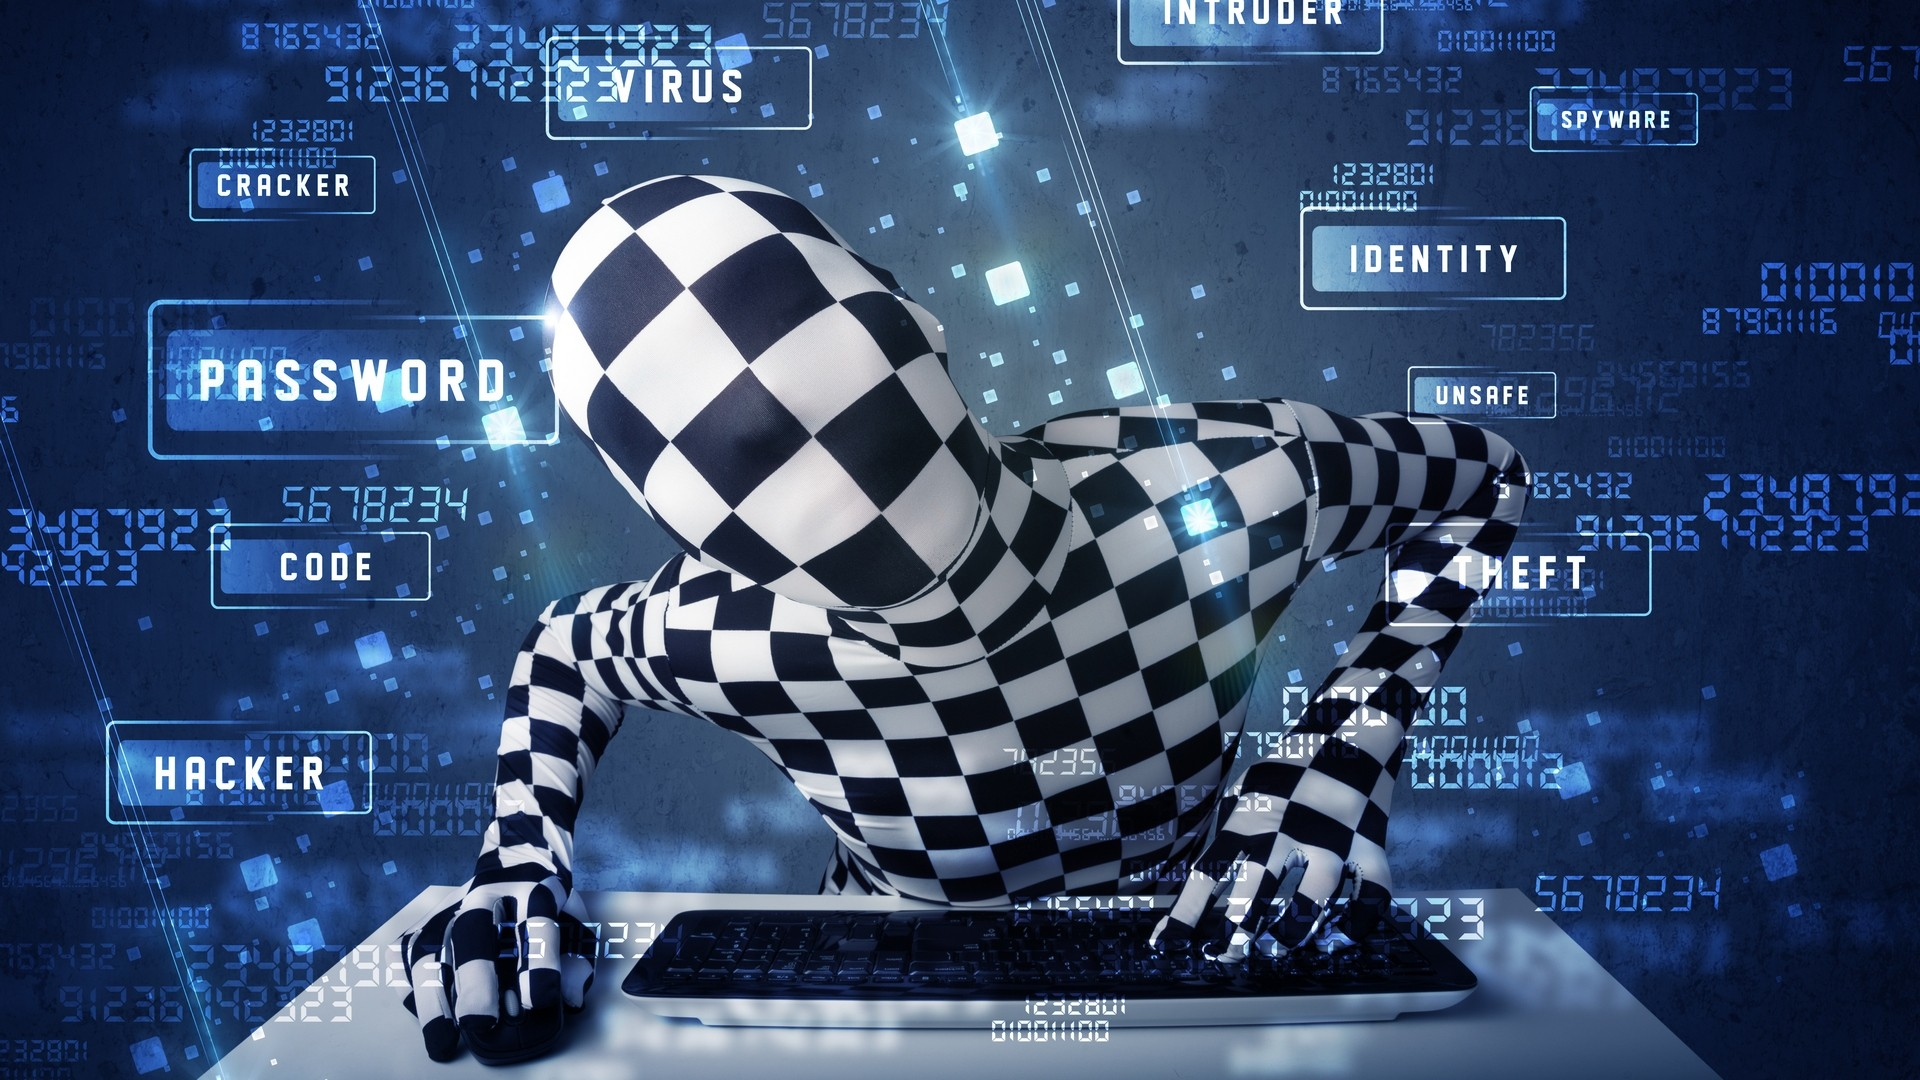 Group-IB За 2015 год киберпреступники украли у россиян 2,6 млрд рублей